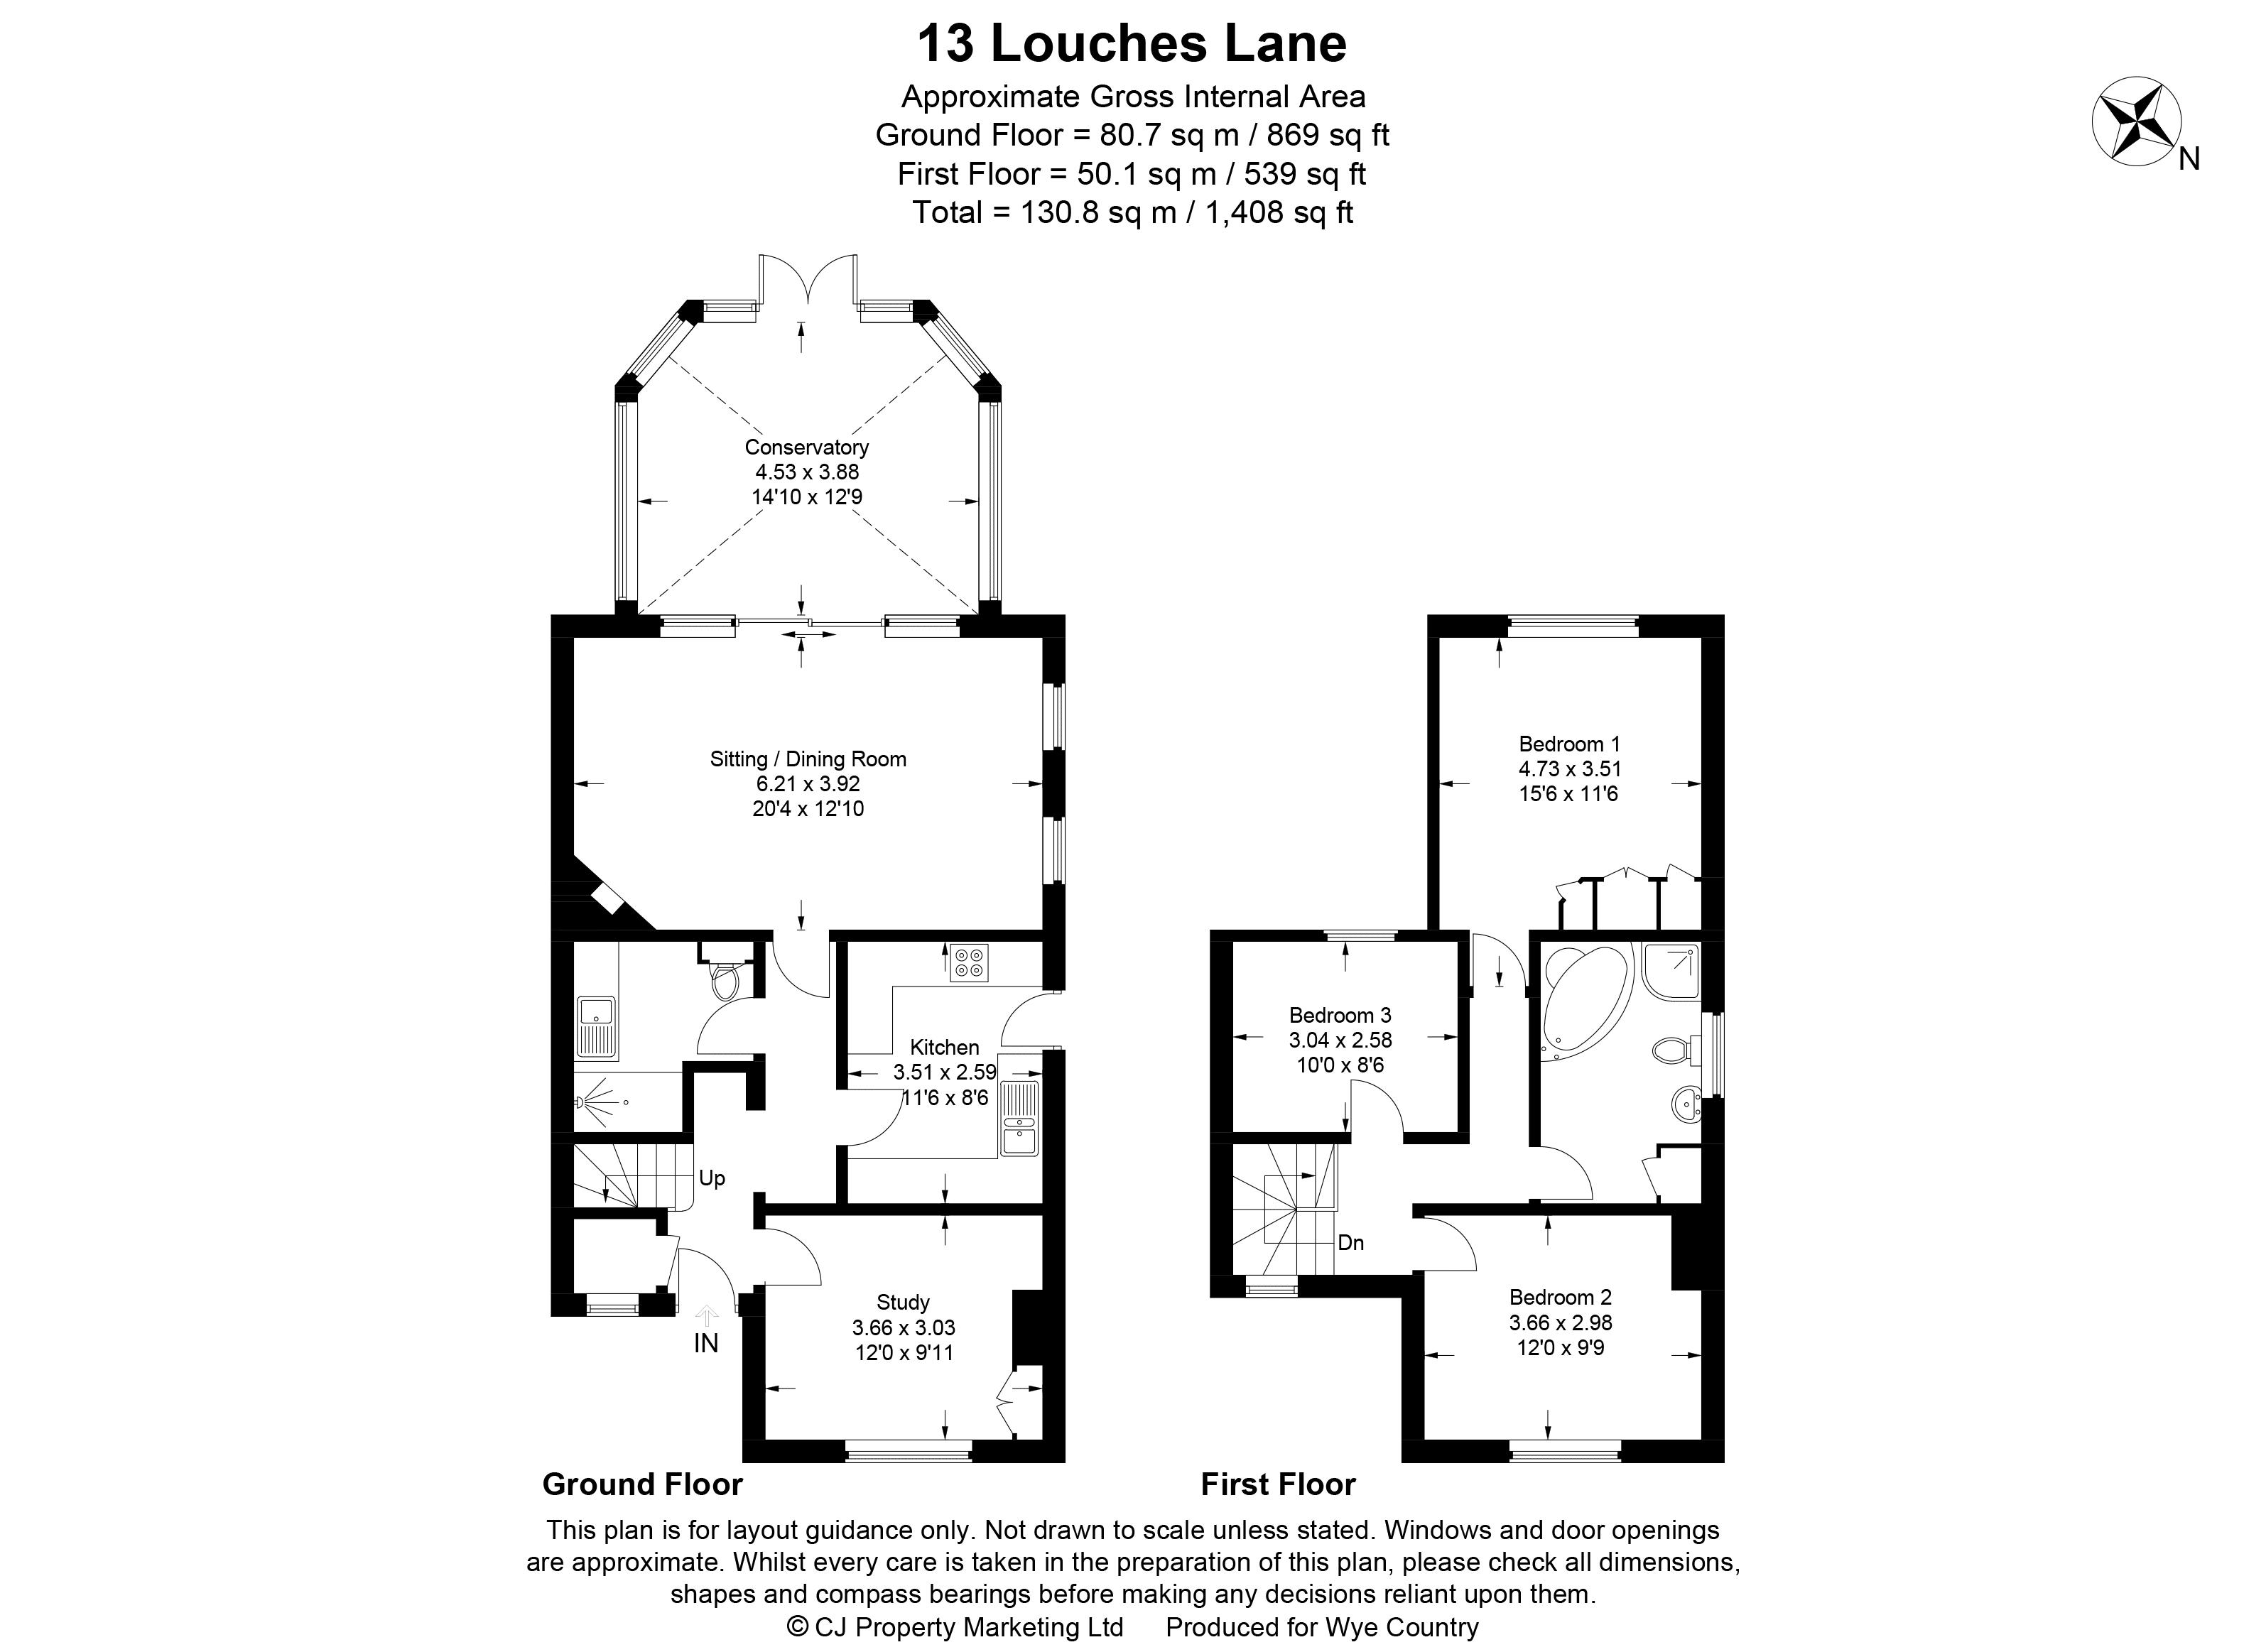 Louches Lane